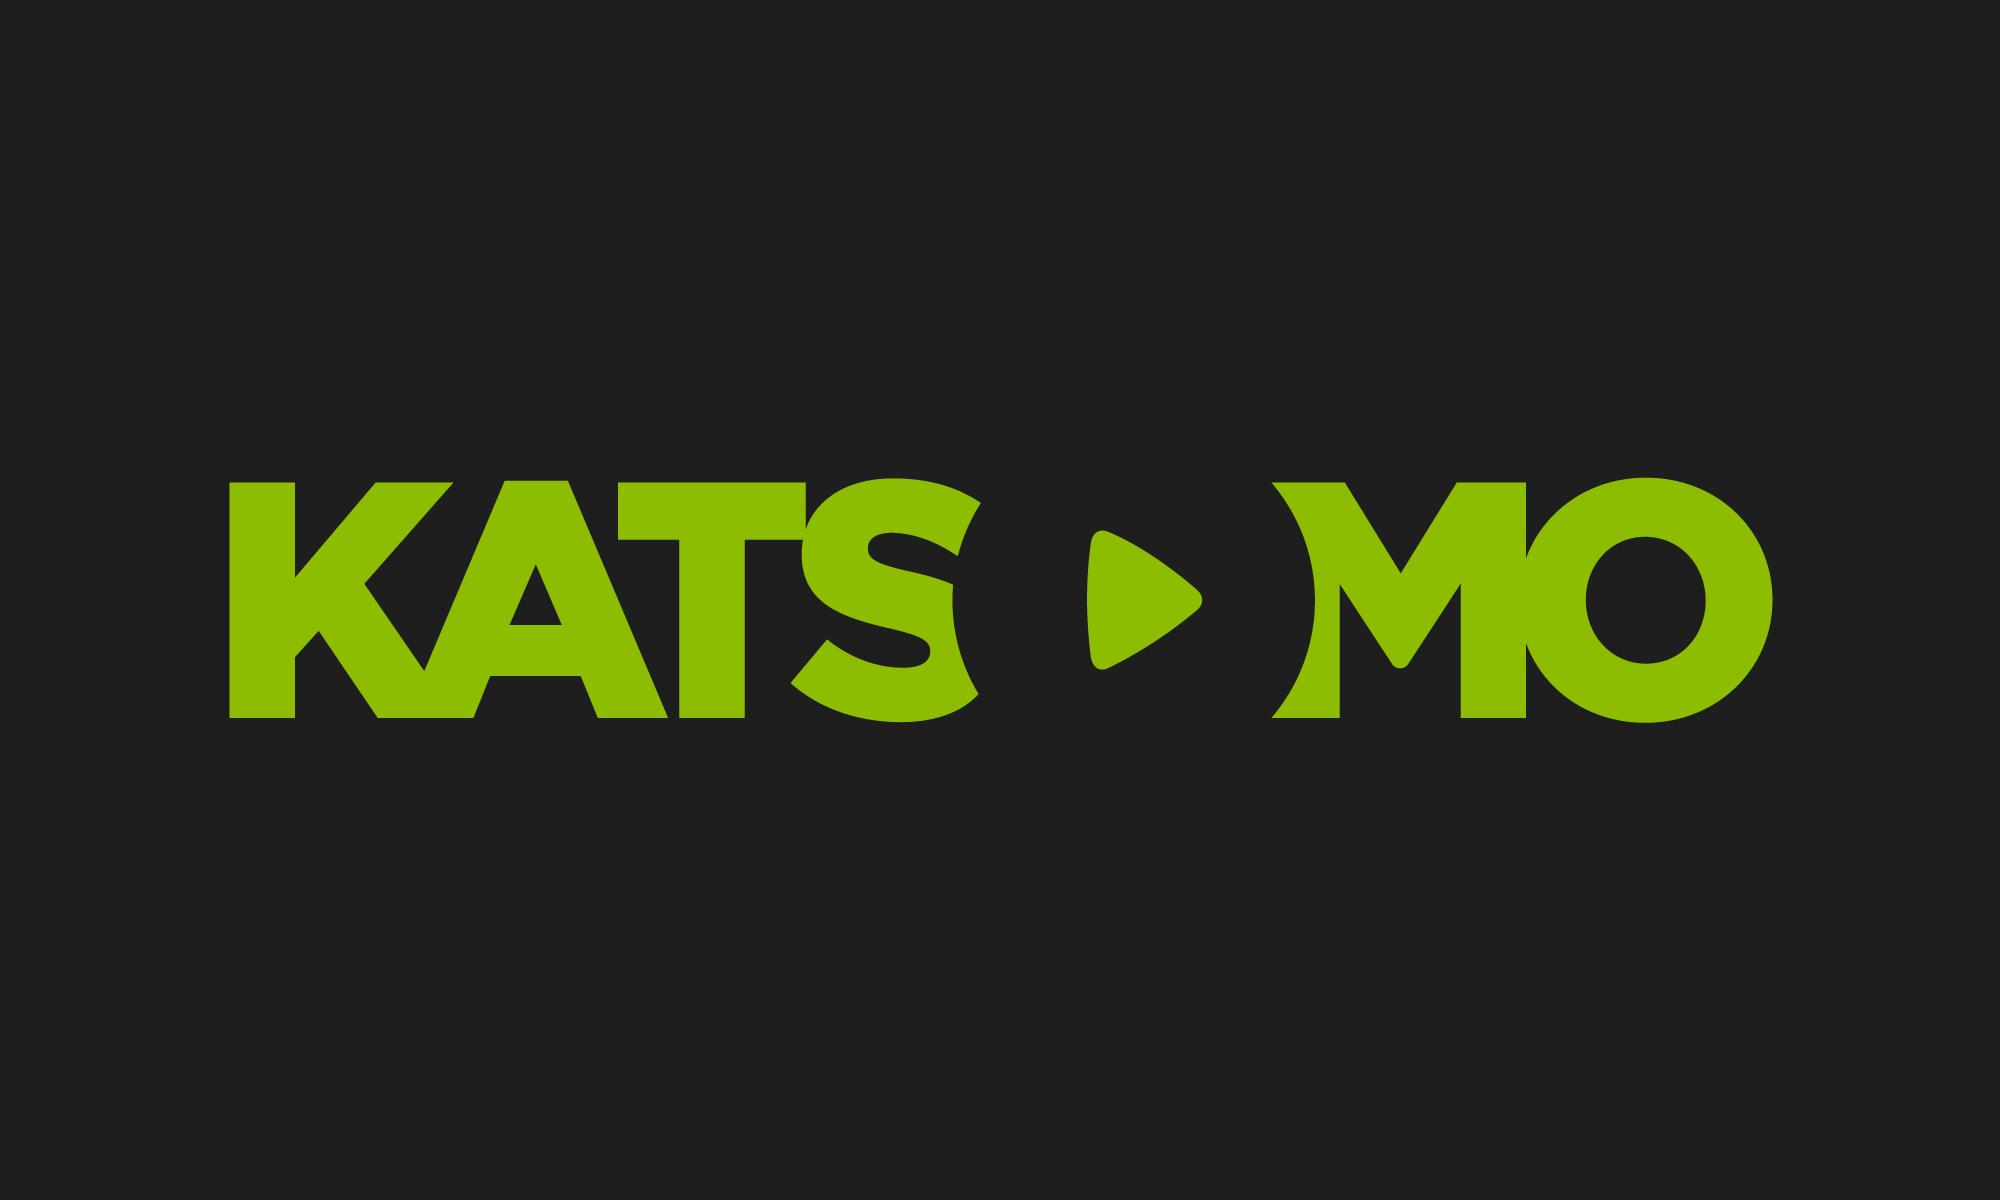 mtv_logo_katsomo